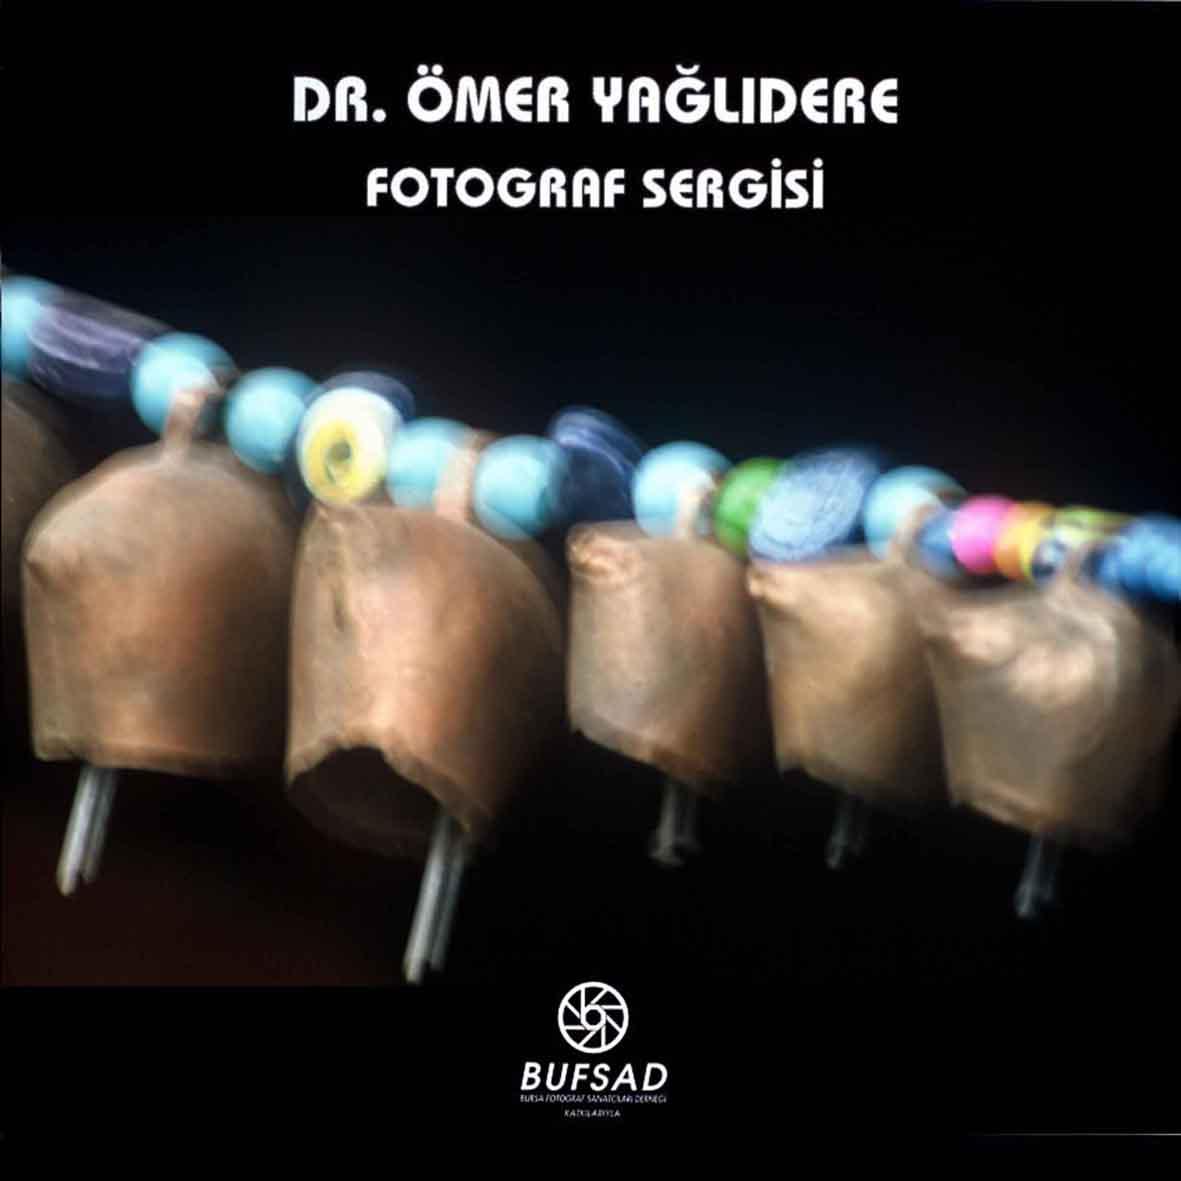 Dr.Omer Yaglidere